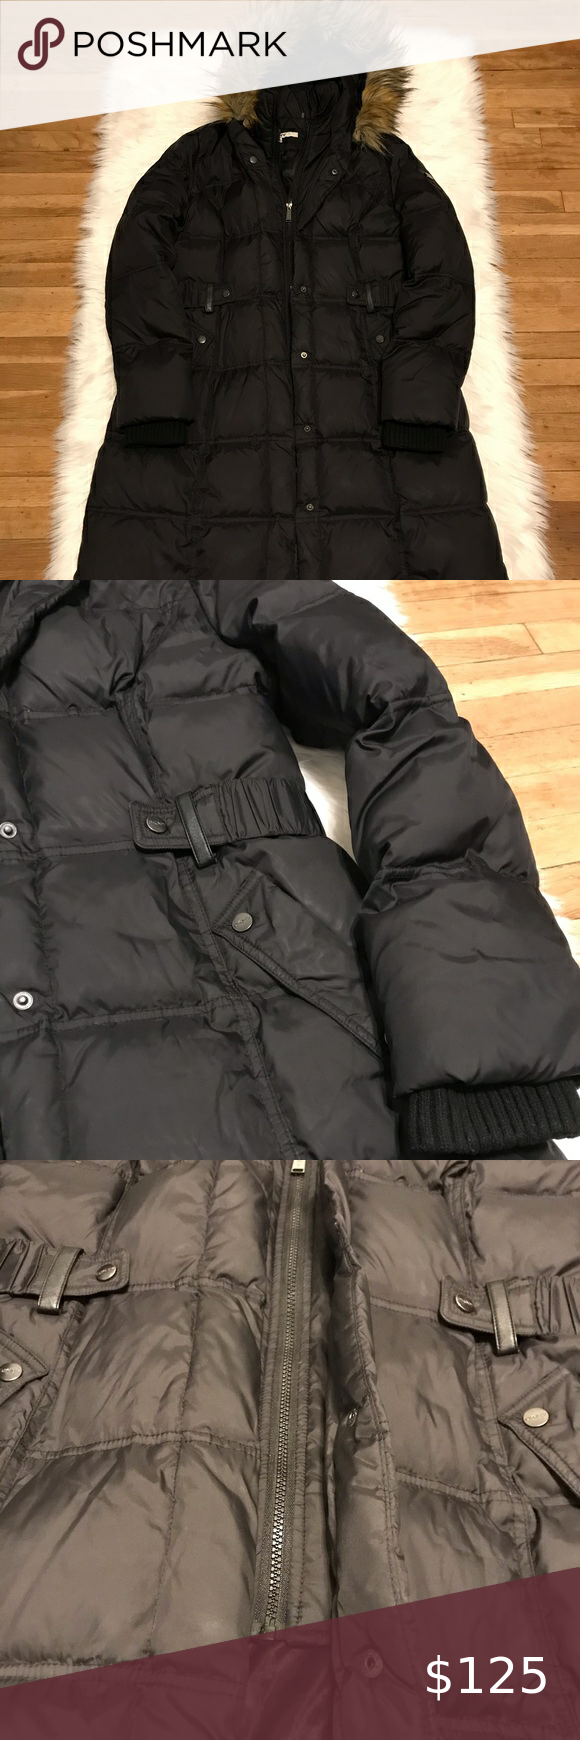 Dkny Black Winter Puffer Coat Winter Puffer Coat Puffer Coat Dkny [ 1740 x 580 Pixel ]